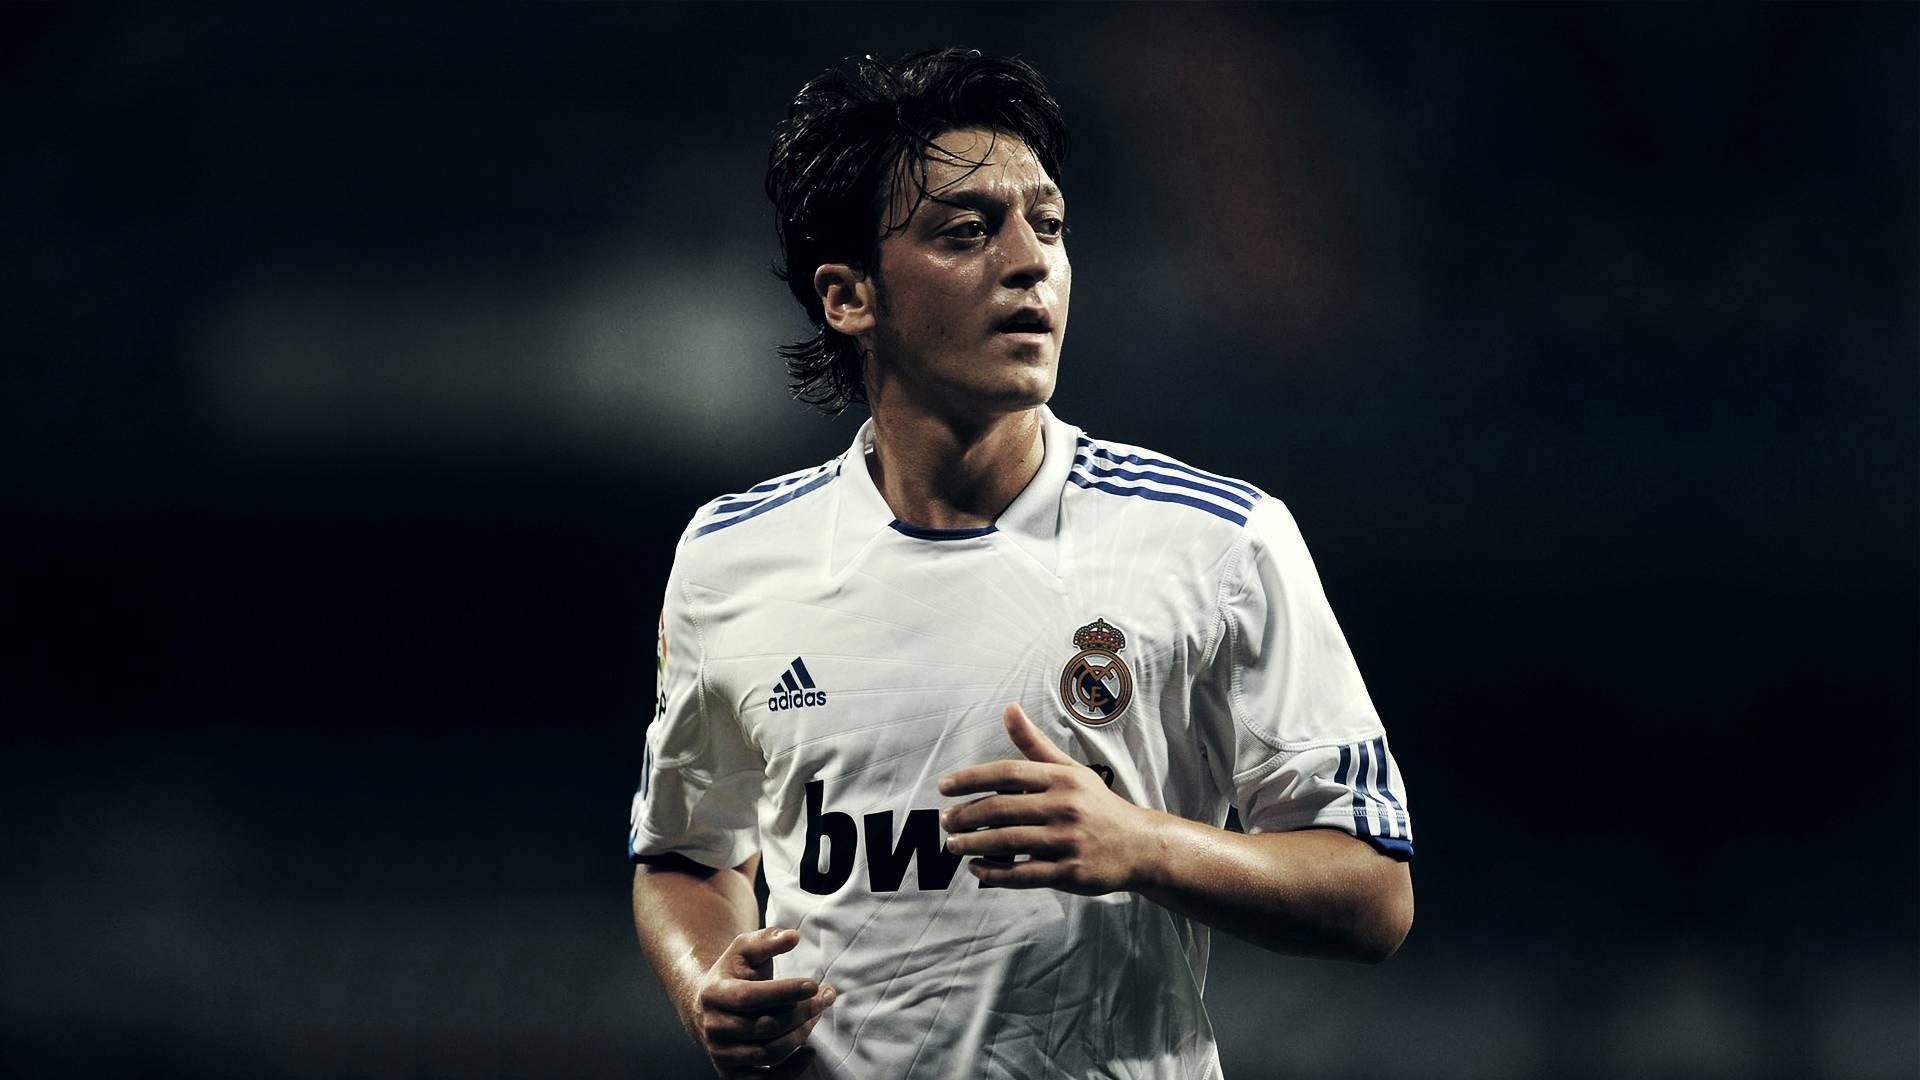 Mesut Ozil Football Players HD Wallpaper